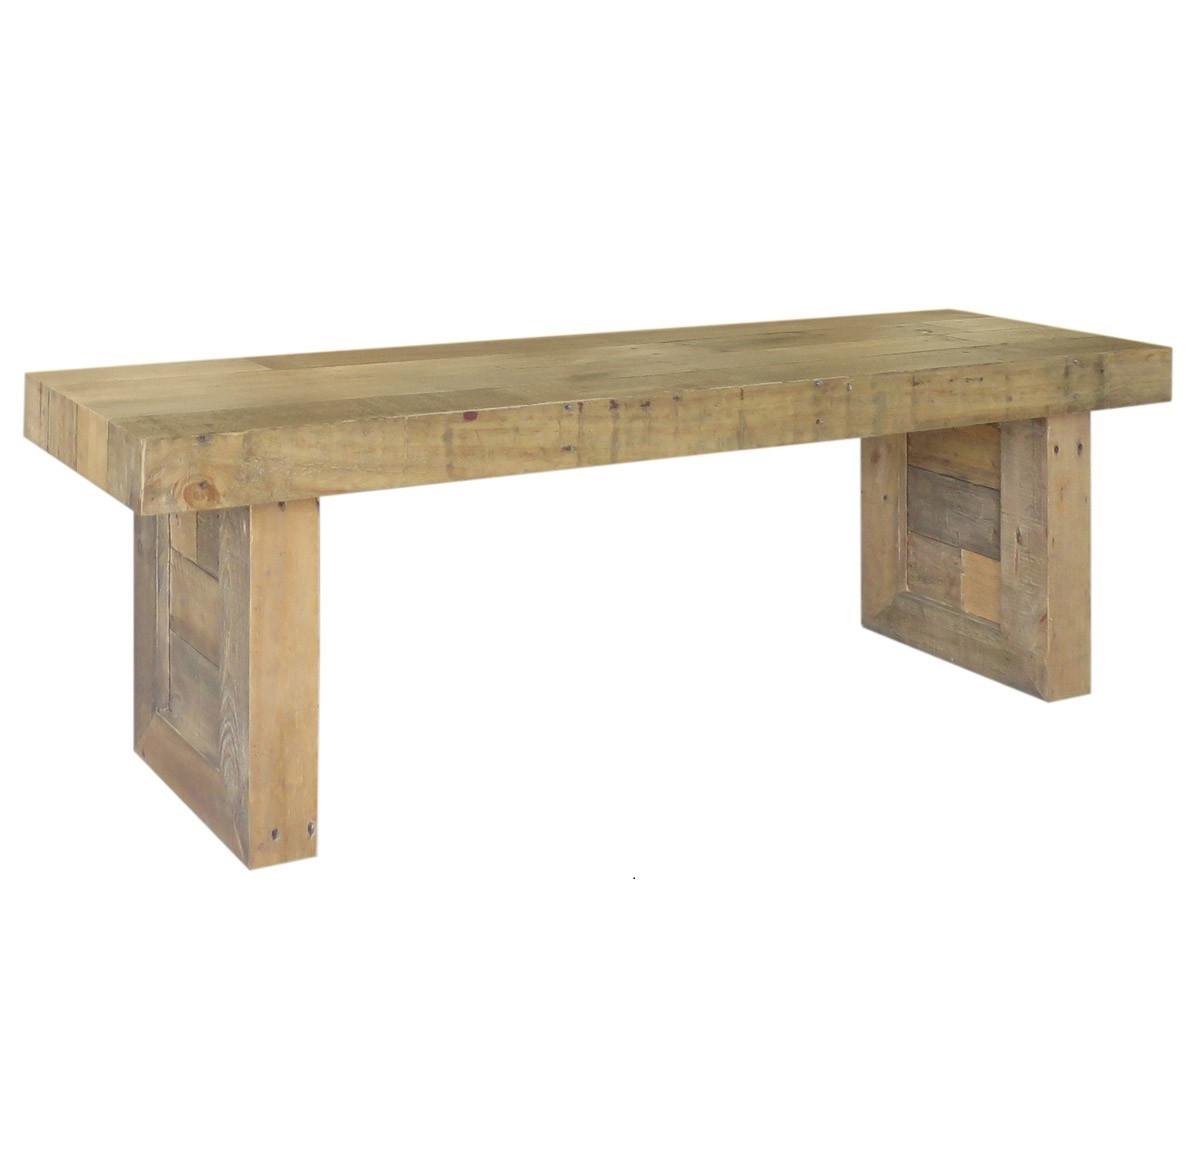 Angora Natural Reclaimed Wood Dining Bench ... - Angora Natural Reclaimed Wood Dining Bench 55